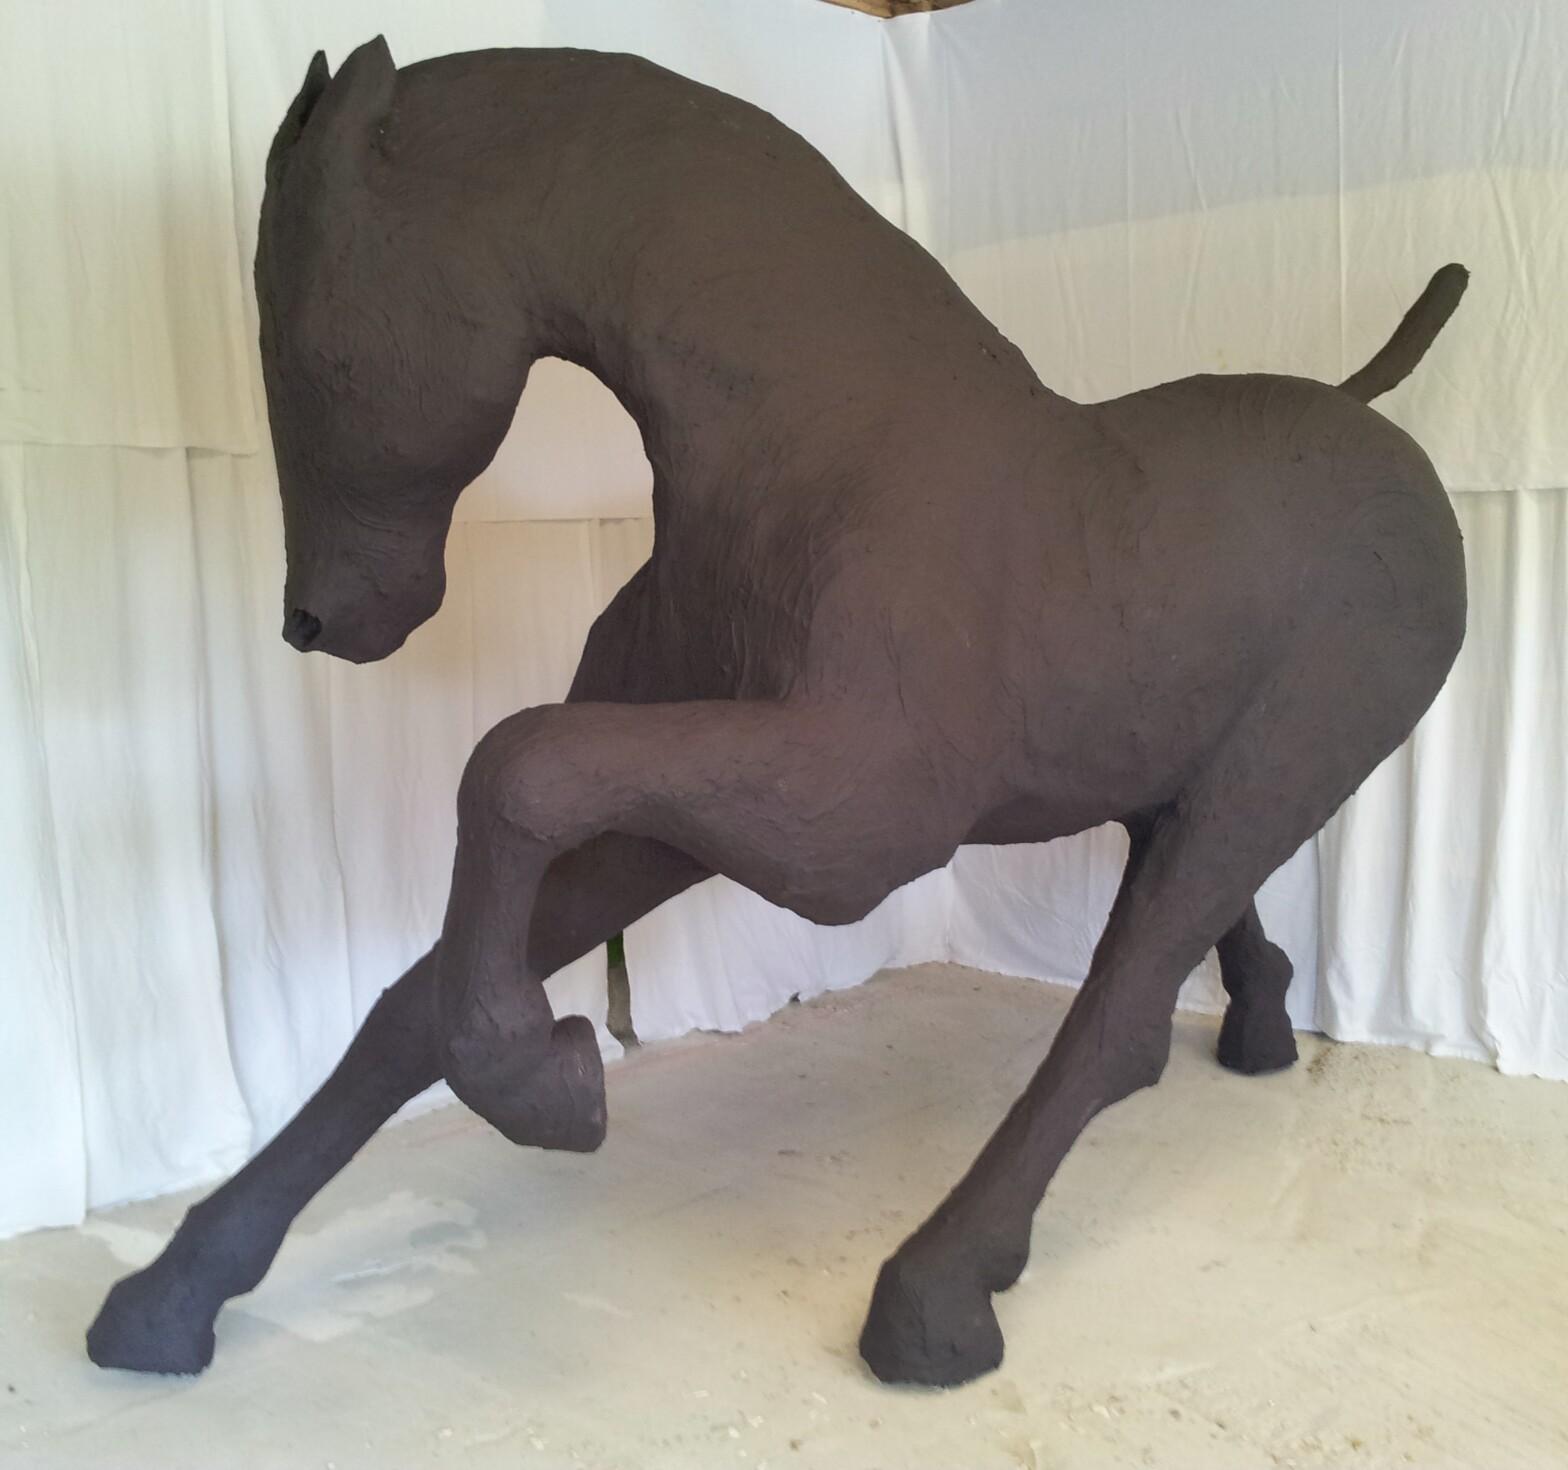 saone de stalh – sculpture monumental – cheval brann – 2014